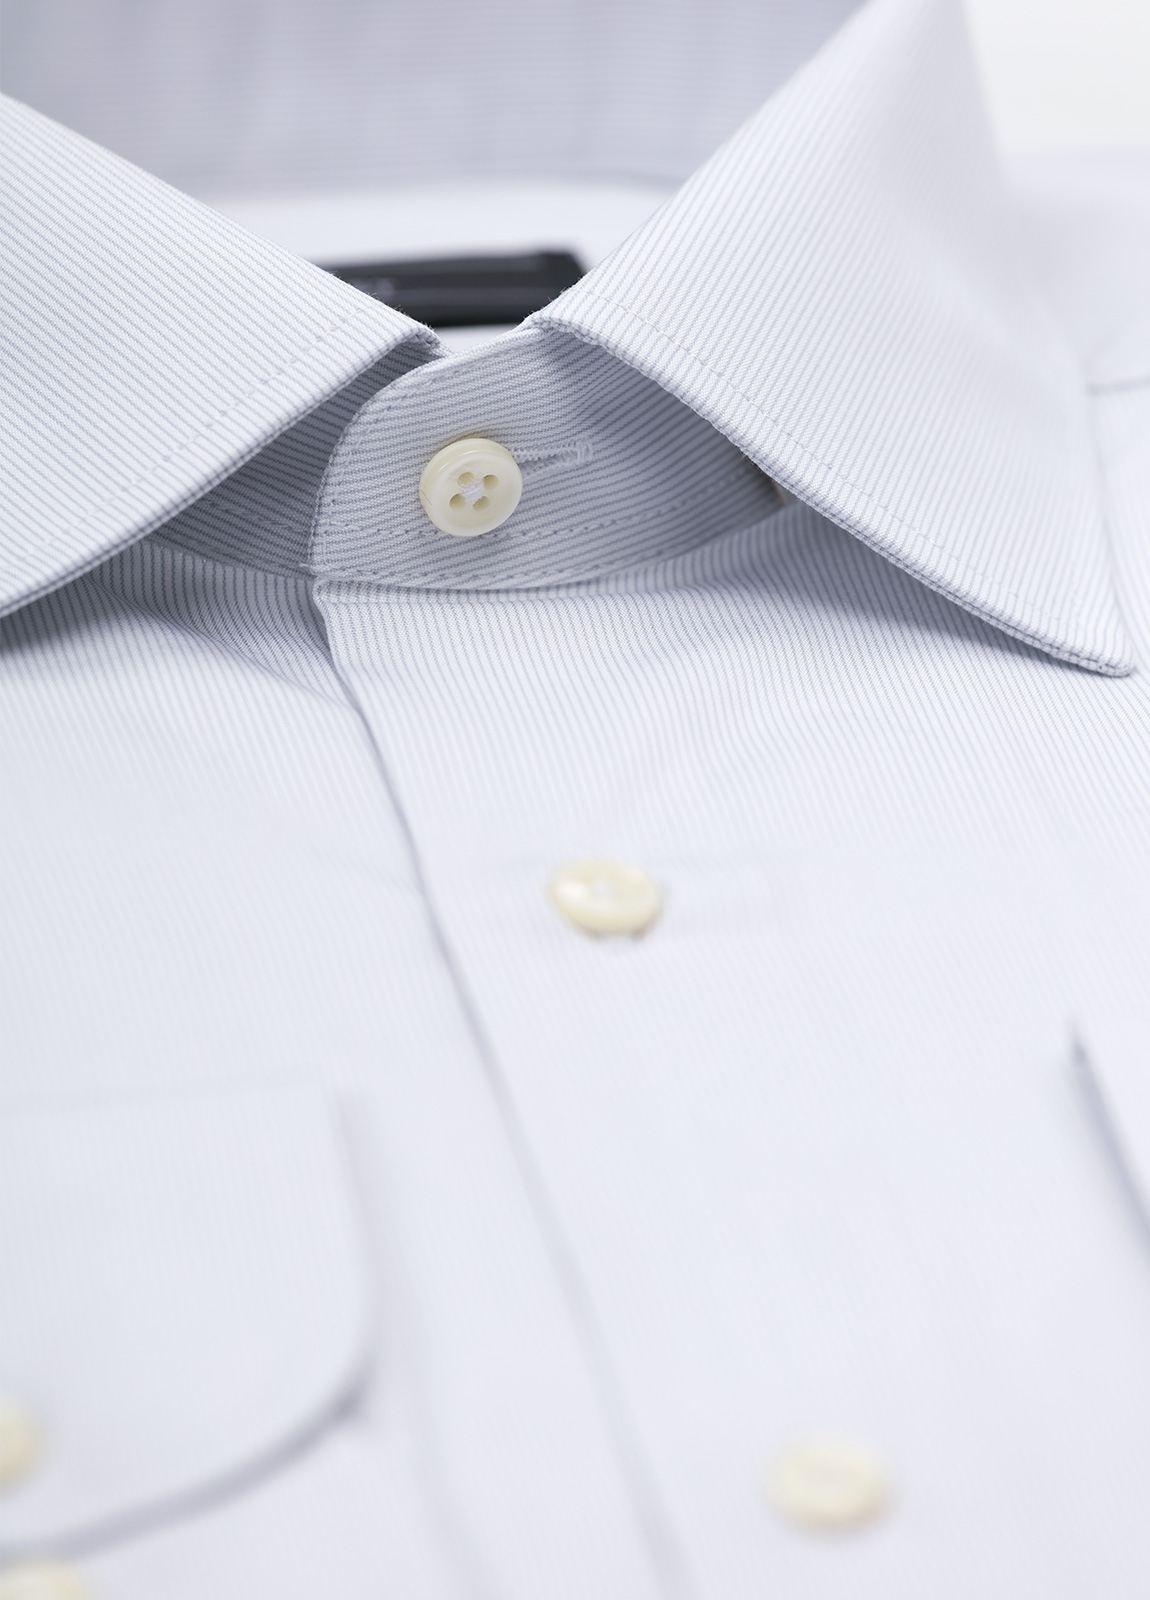 Camisa Formal Wear SLIM FIT cuello italiano modelo ROMA. Raya fina color gris. 100% Algodón. - Ítem1